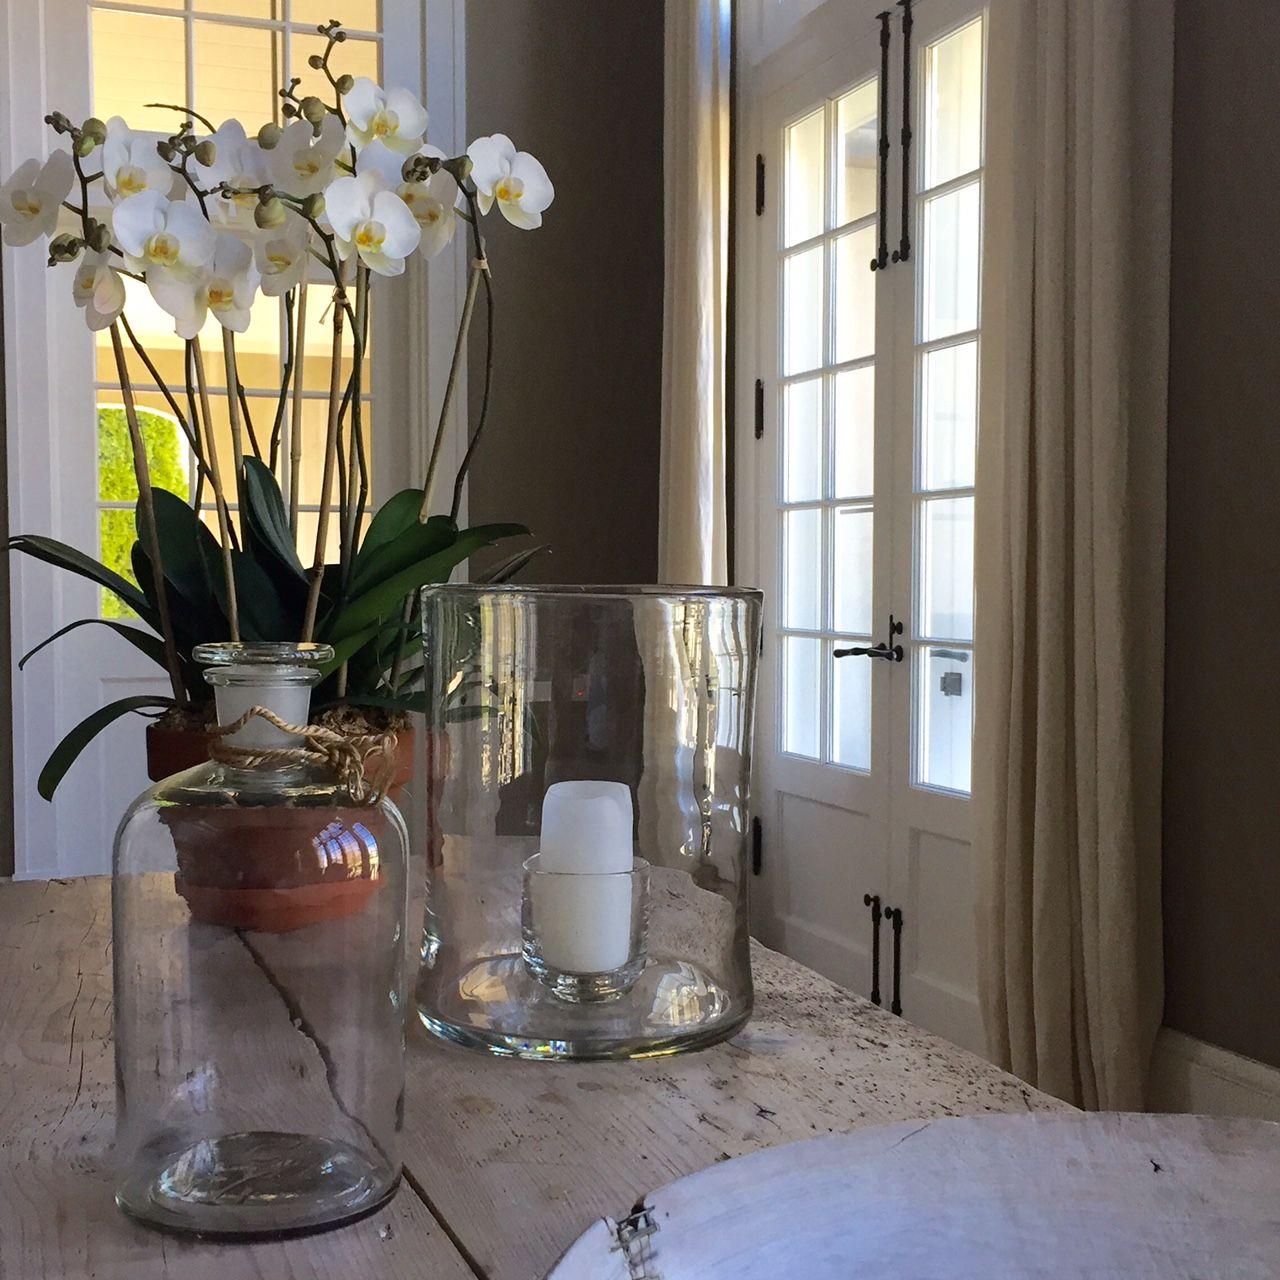 Ina Garten's New Cookbook & Dining Room Tips! 5